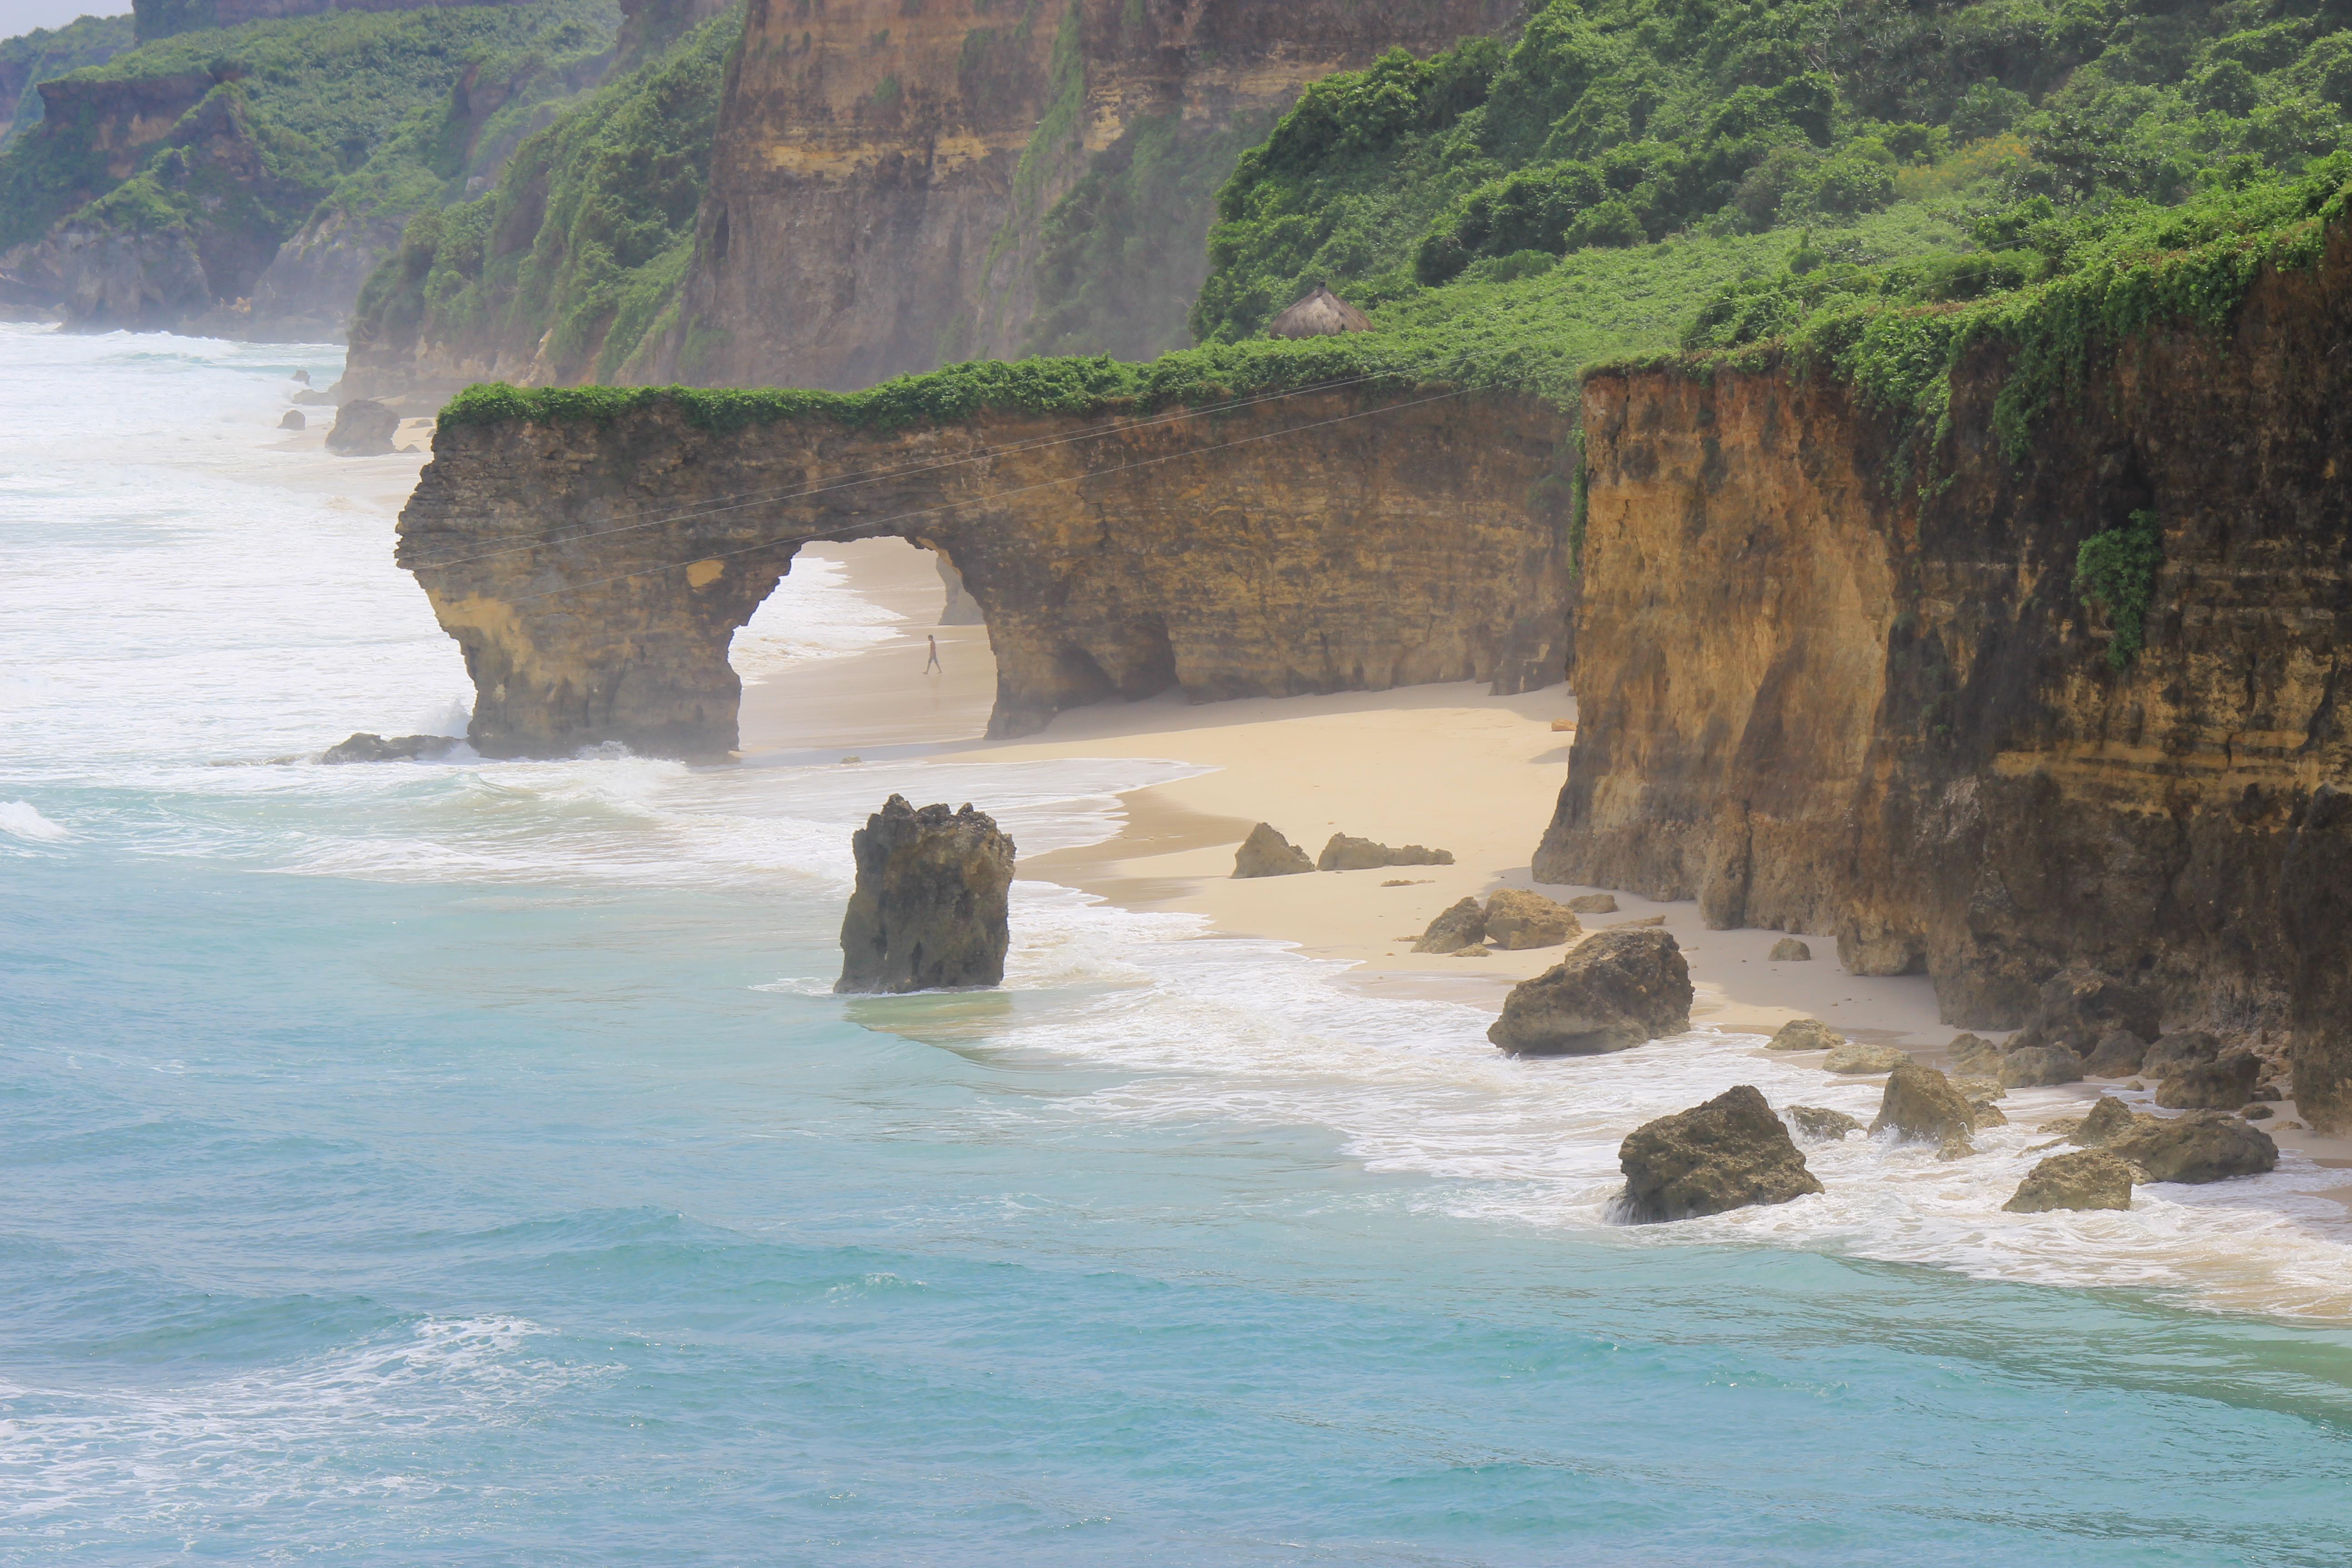 File:Pantai Mbawana, Sumba Barat Daya.jpg - Wikimedia Commons